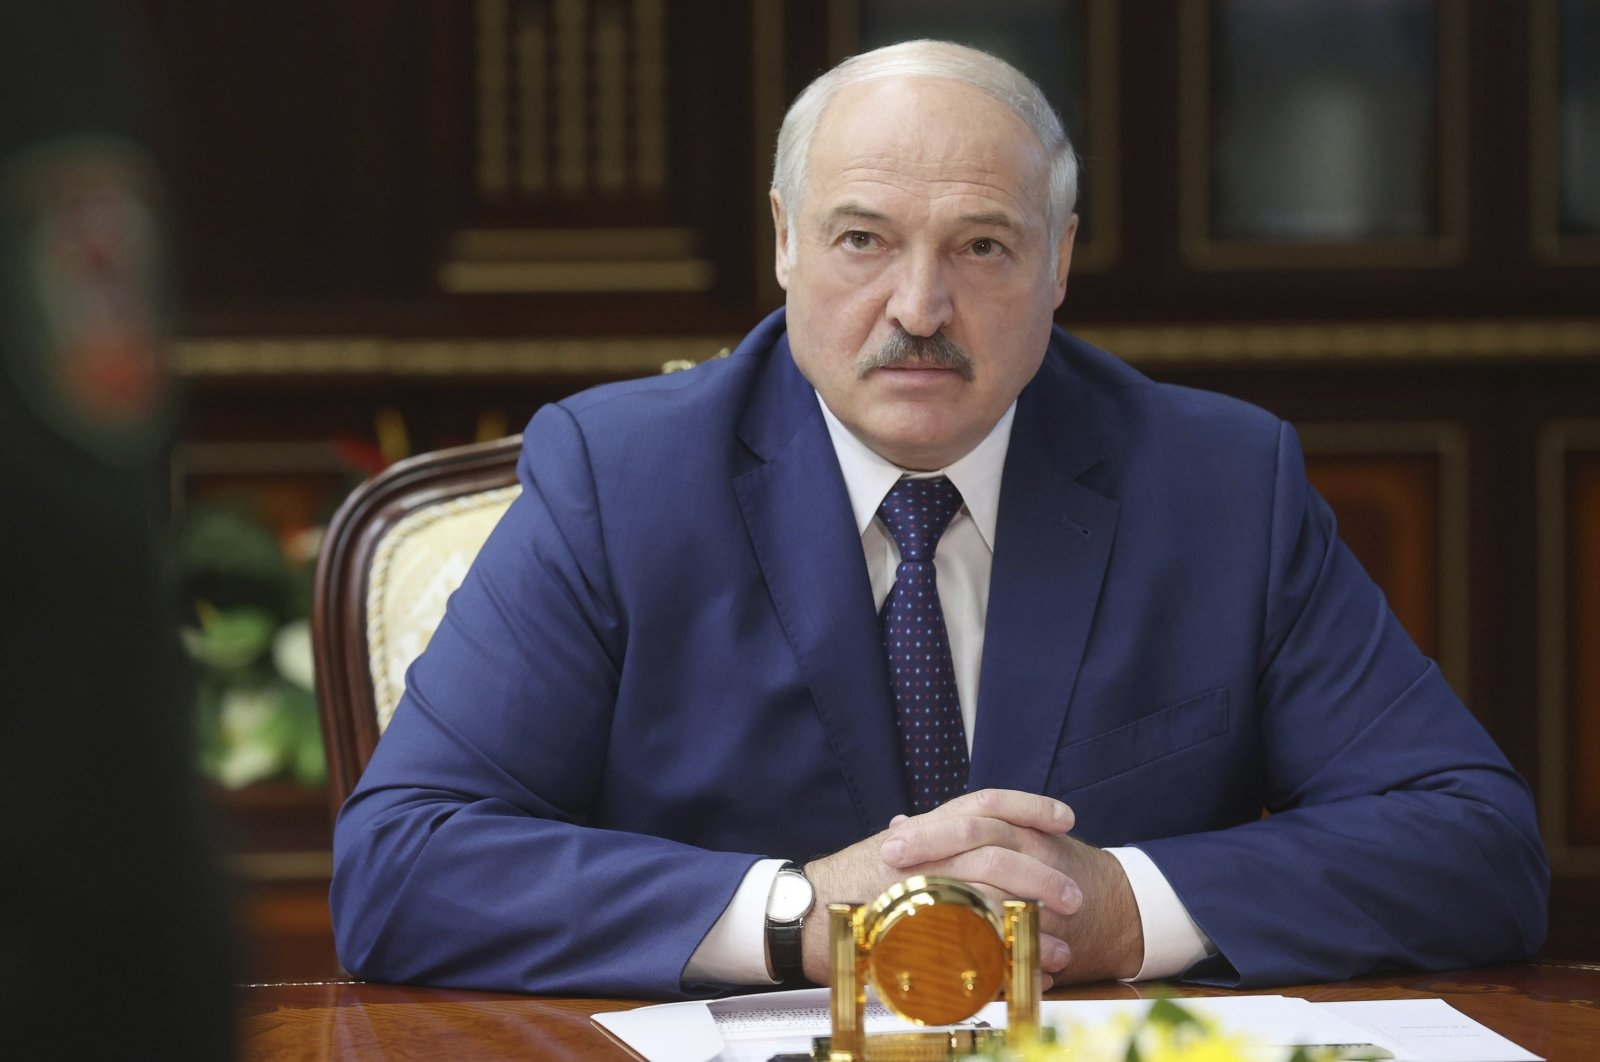 Belarusian President Alexander Lukashenko speaks to high level military officials in Minsk, Belarus, Aug. 5, 2021. (AP Photo)